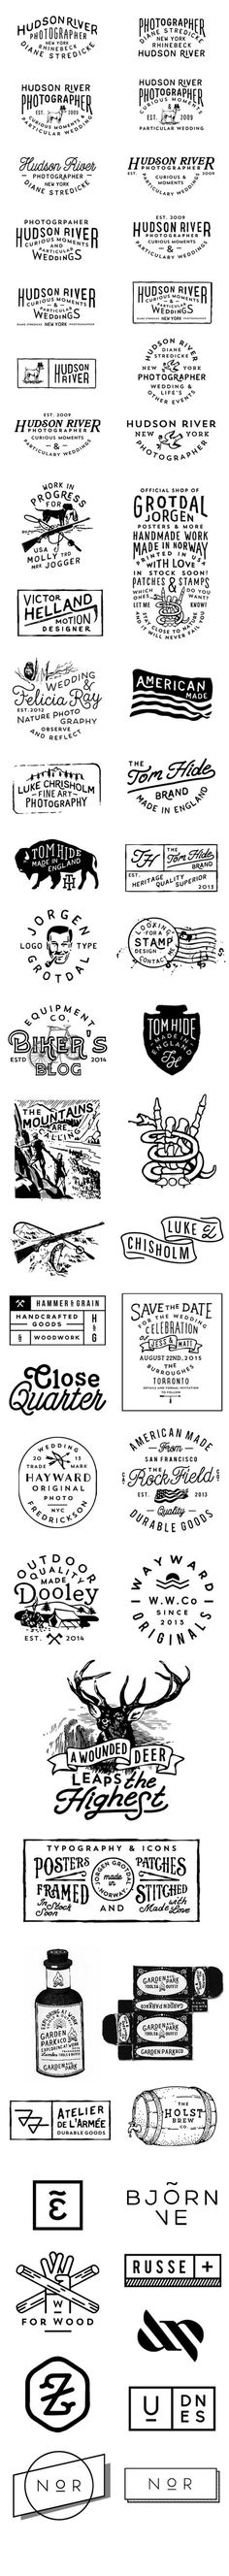 2014 pt.1 on Typography Served: